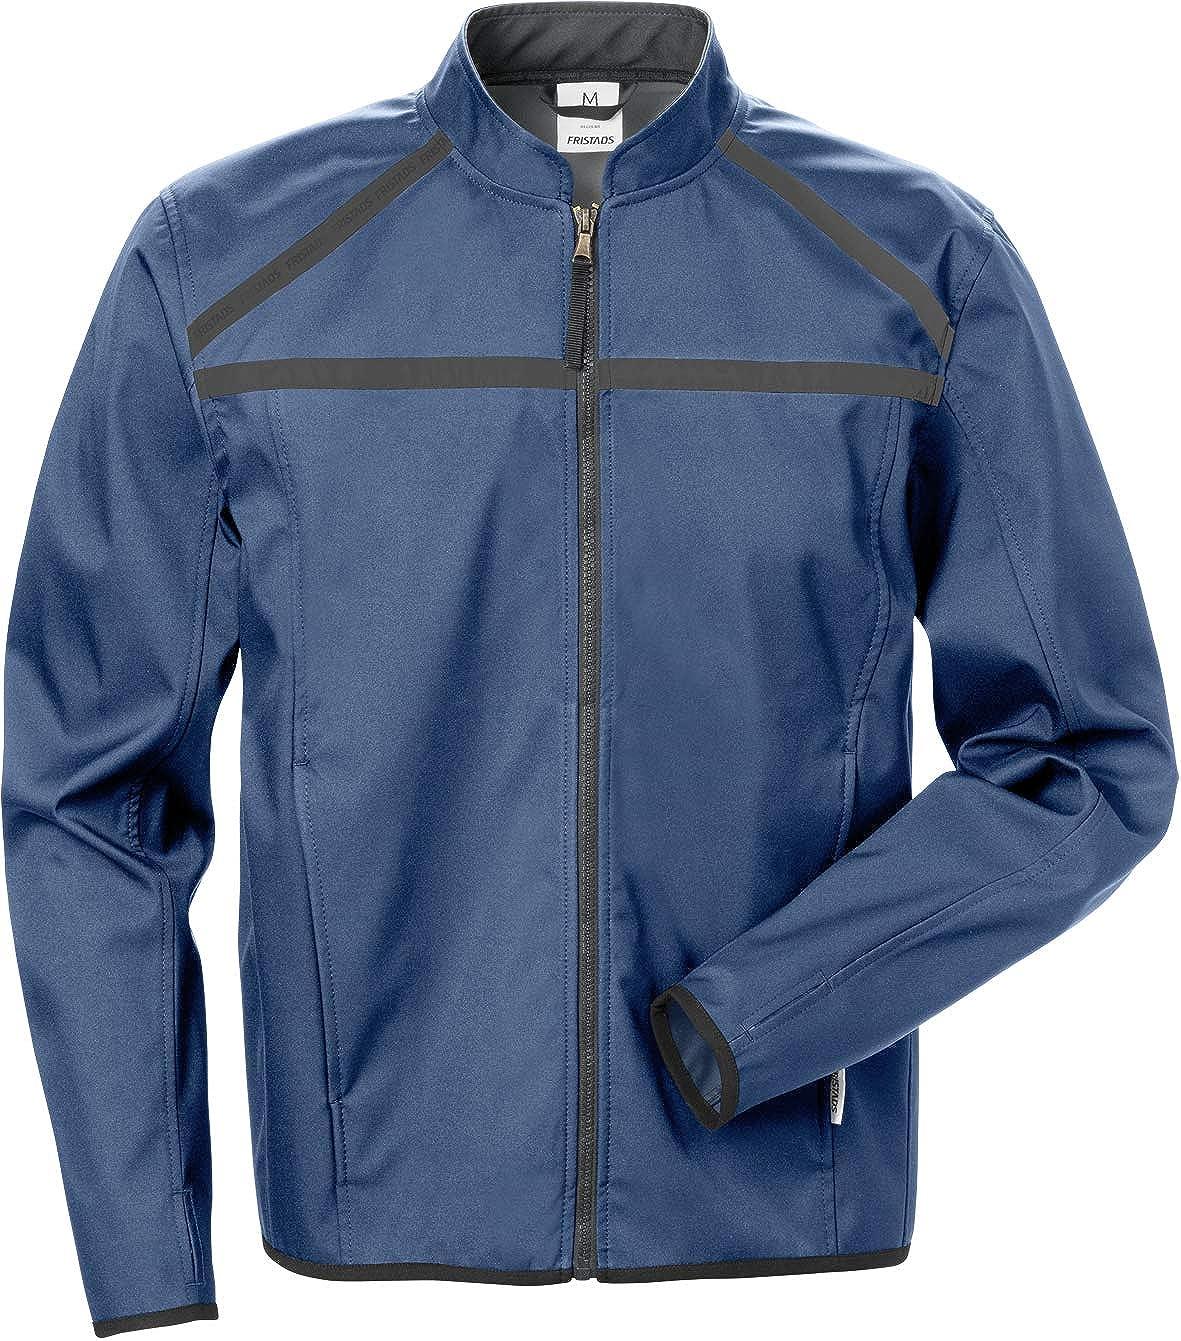 Fristads Workwear 129531 Mens Soft Shell Jacket